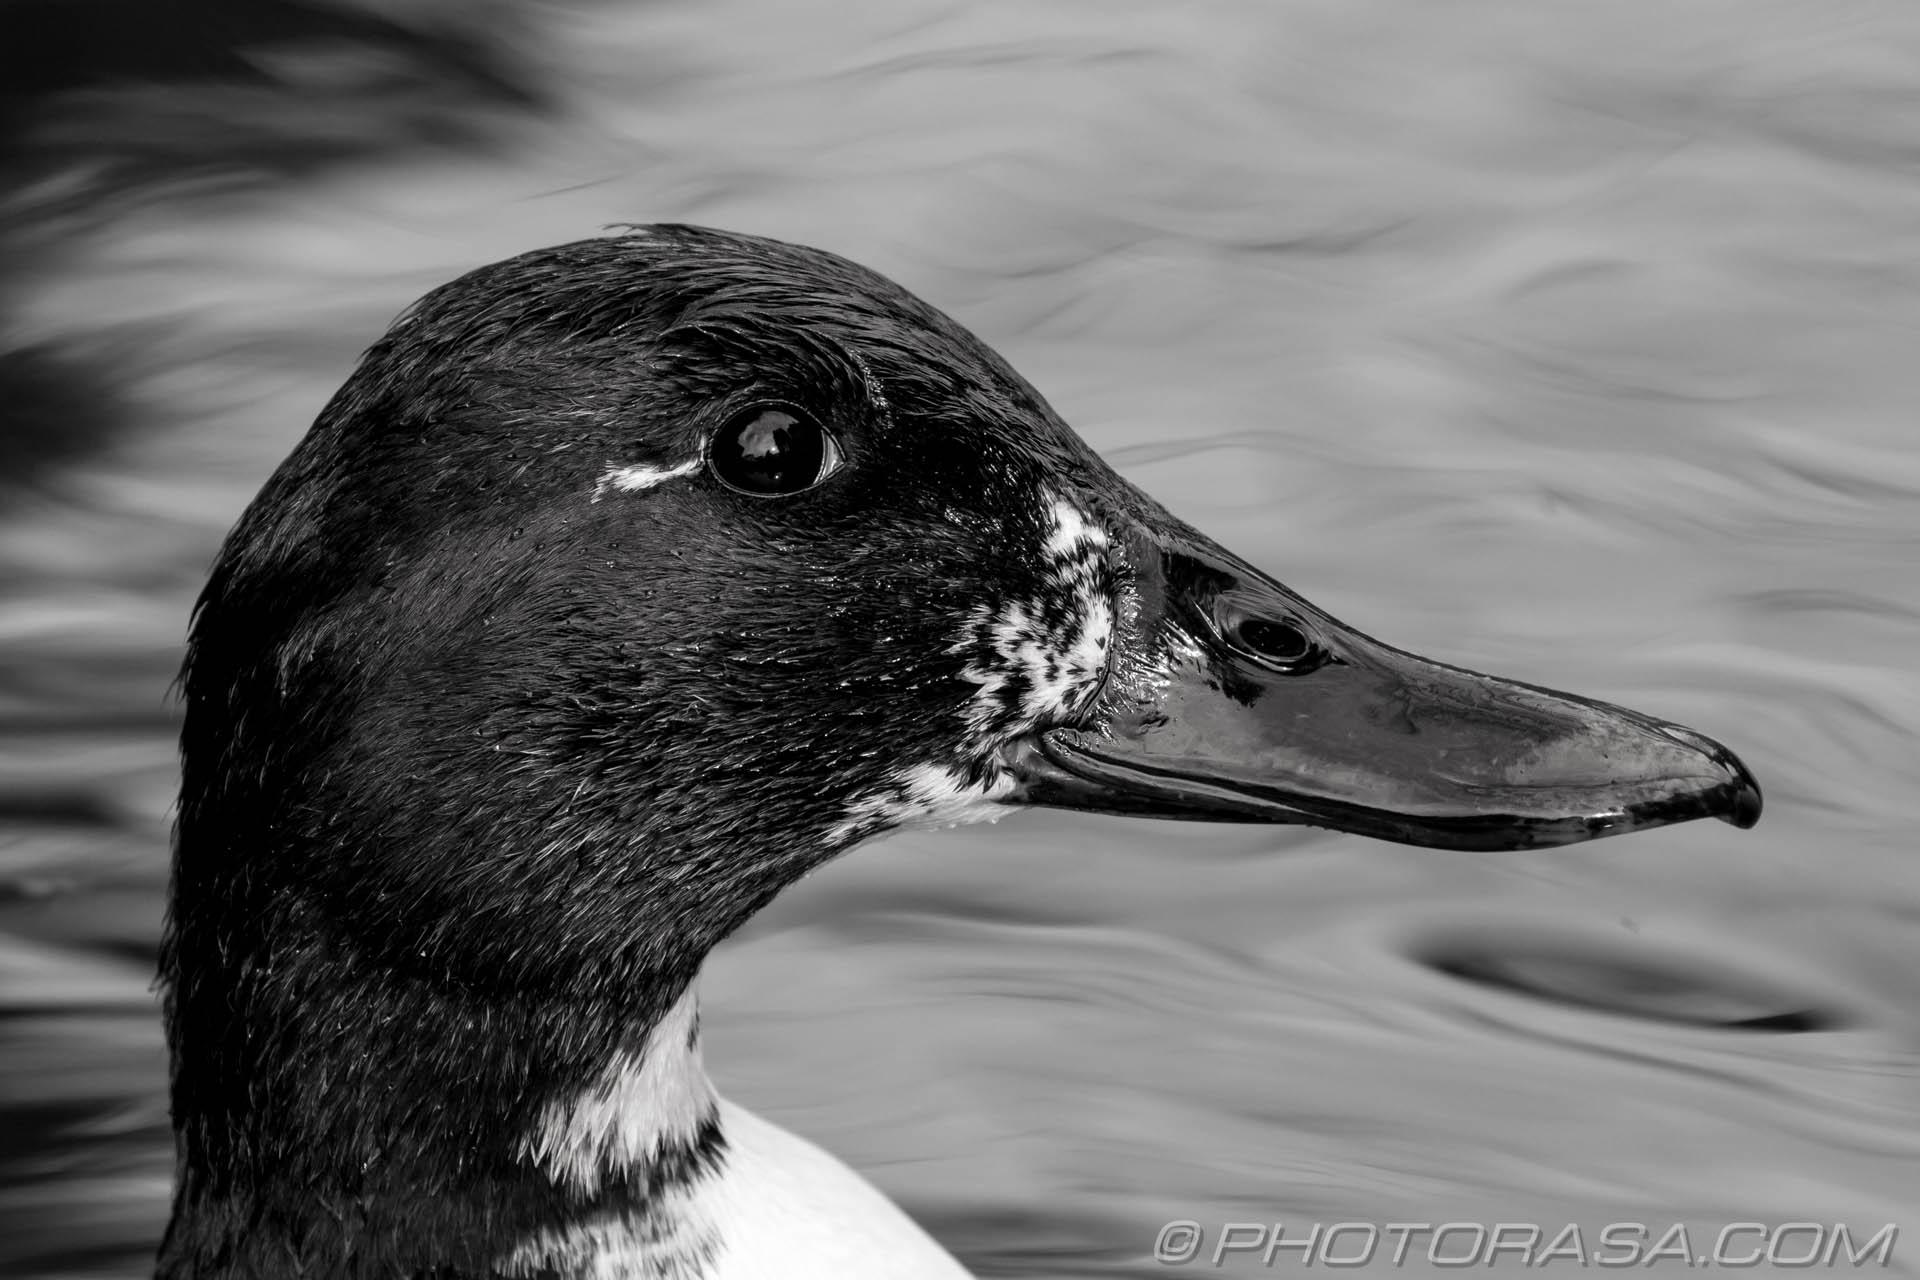 https://photorasa.com/black-and-white-duck/black-and-white-duck-2/